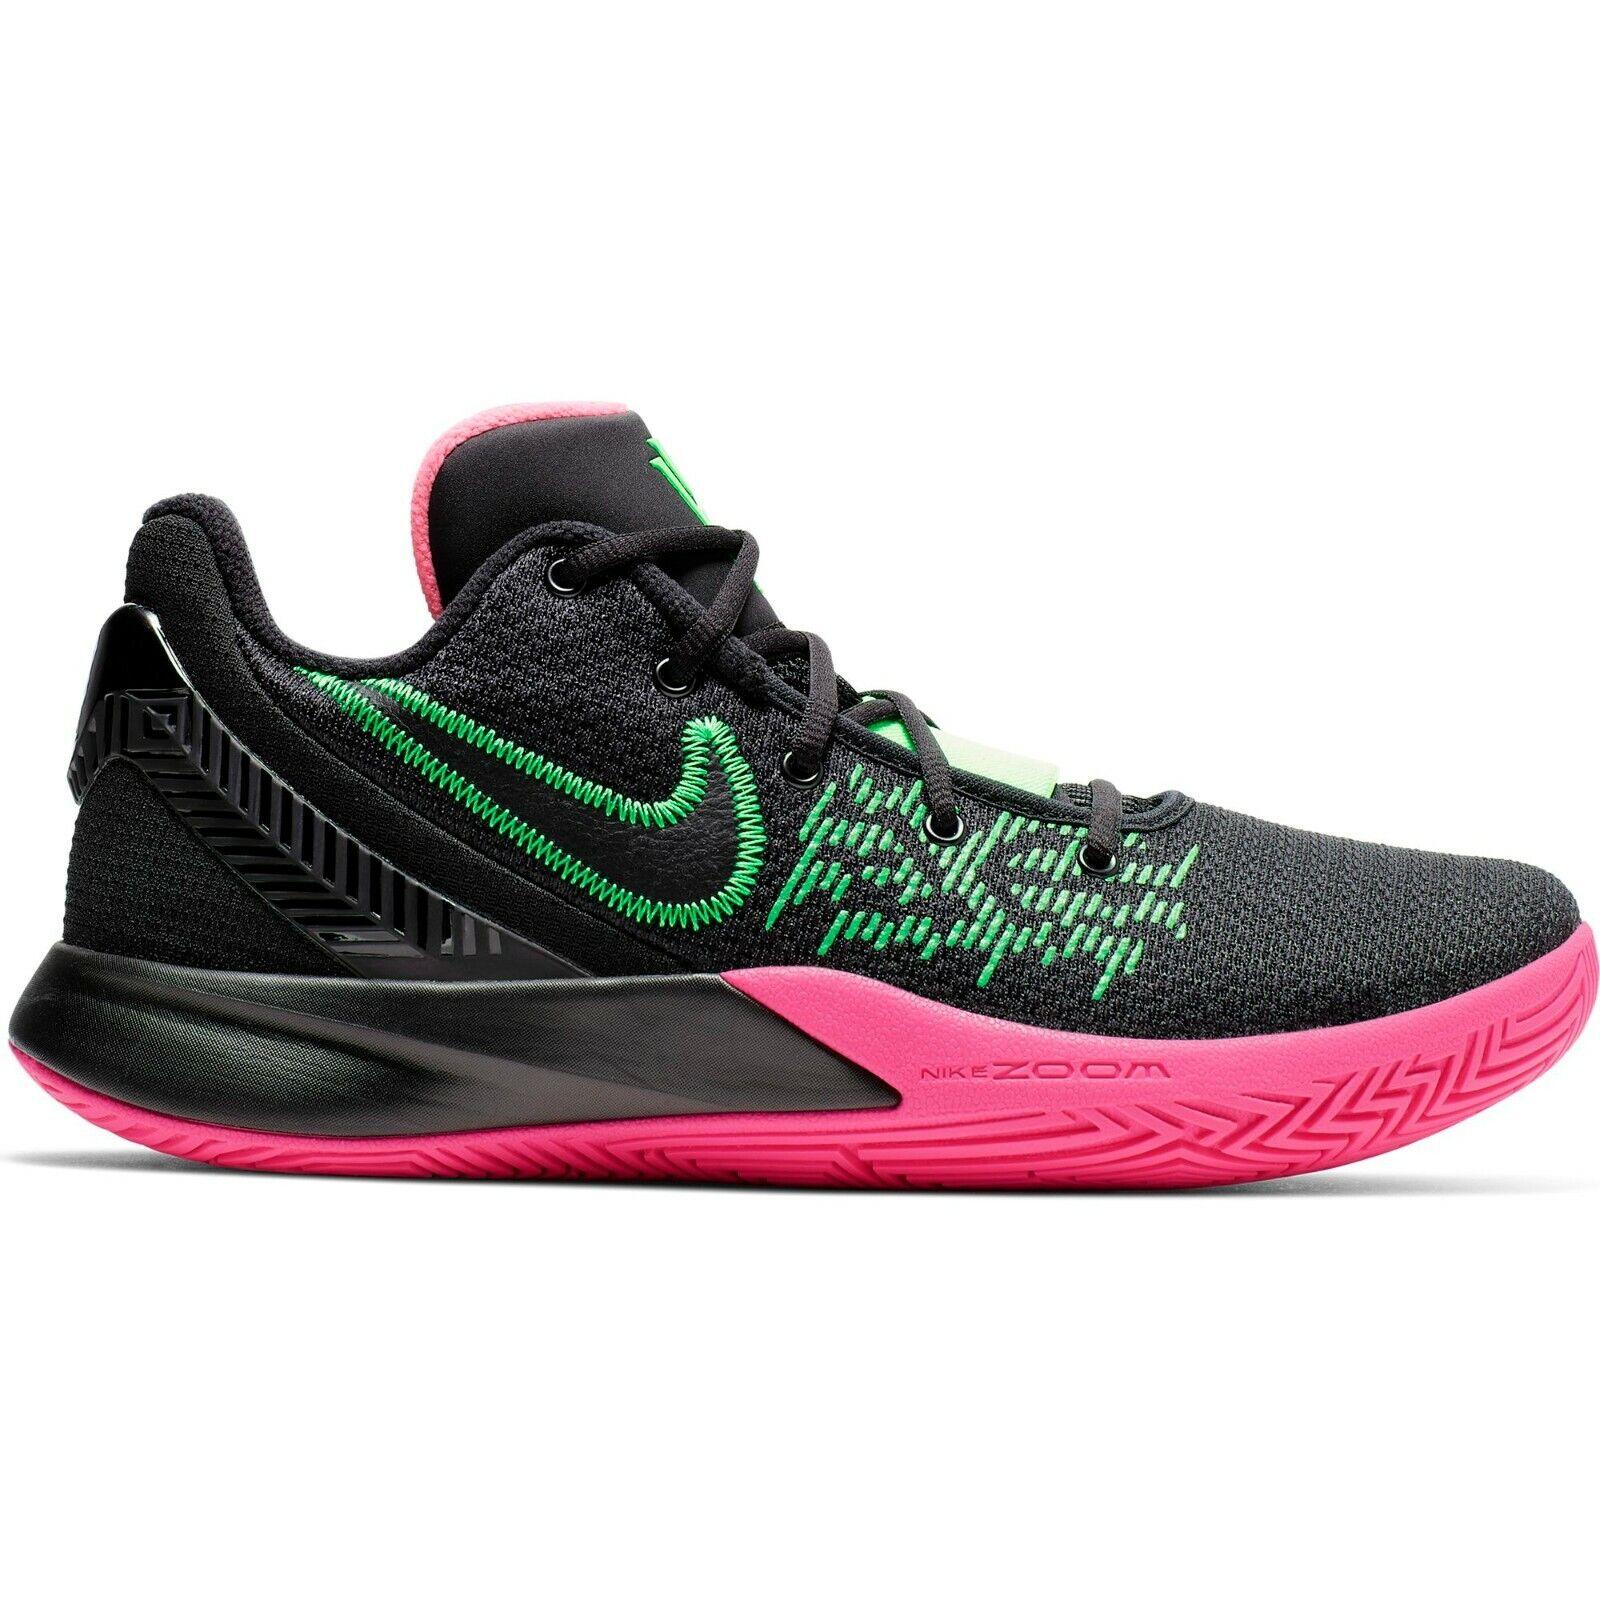 NIKE KYRIE FLY TRAP 2   - Black/ Hyper Pink Green - MEN SIZE